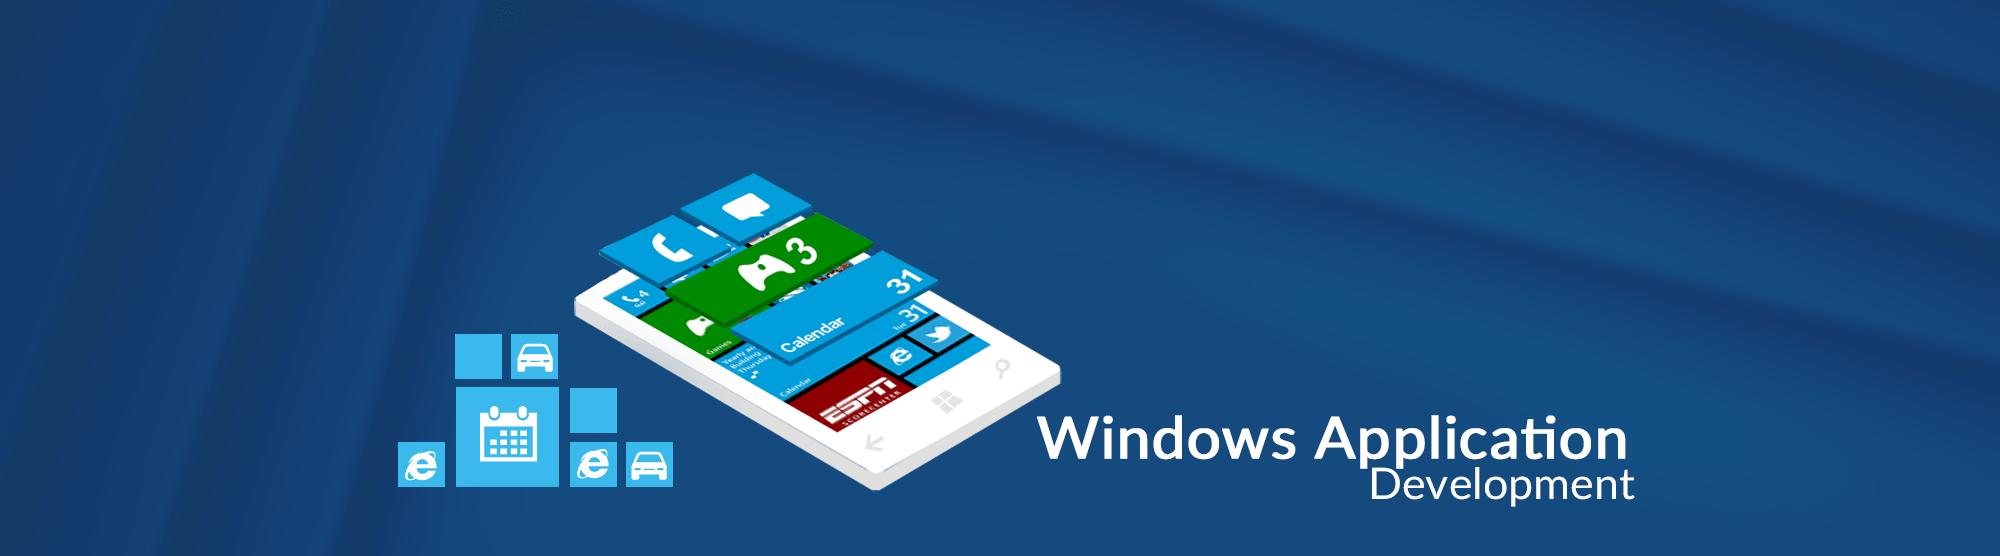 Windows mobile app development services.